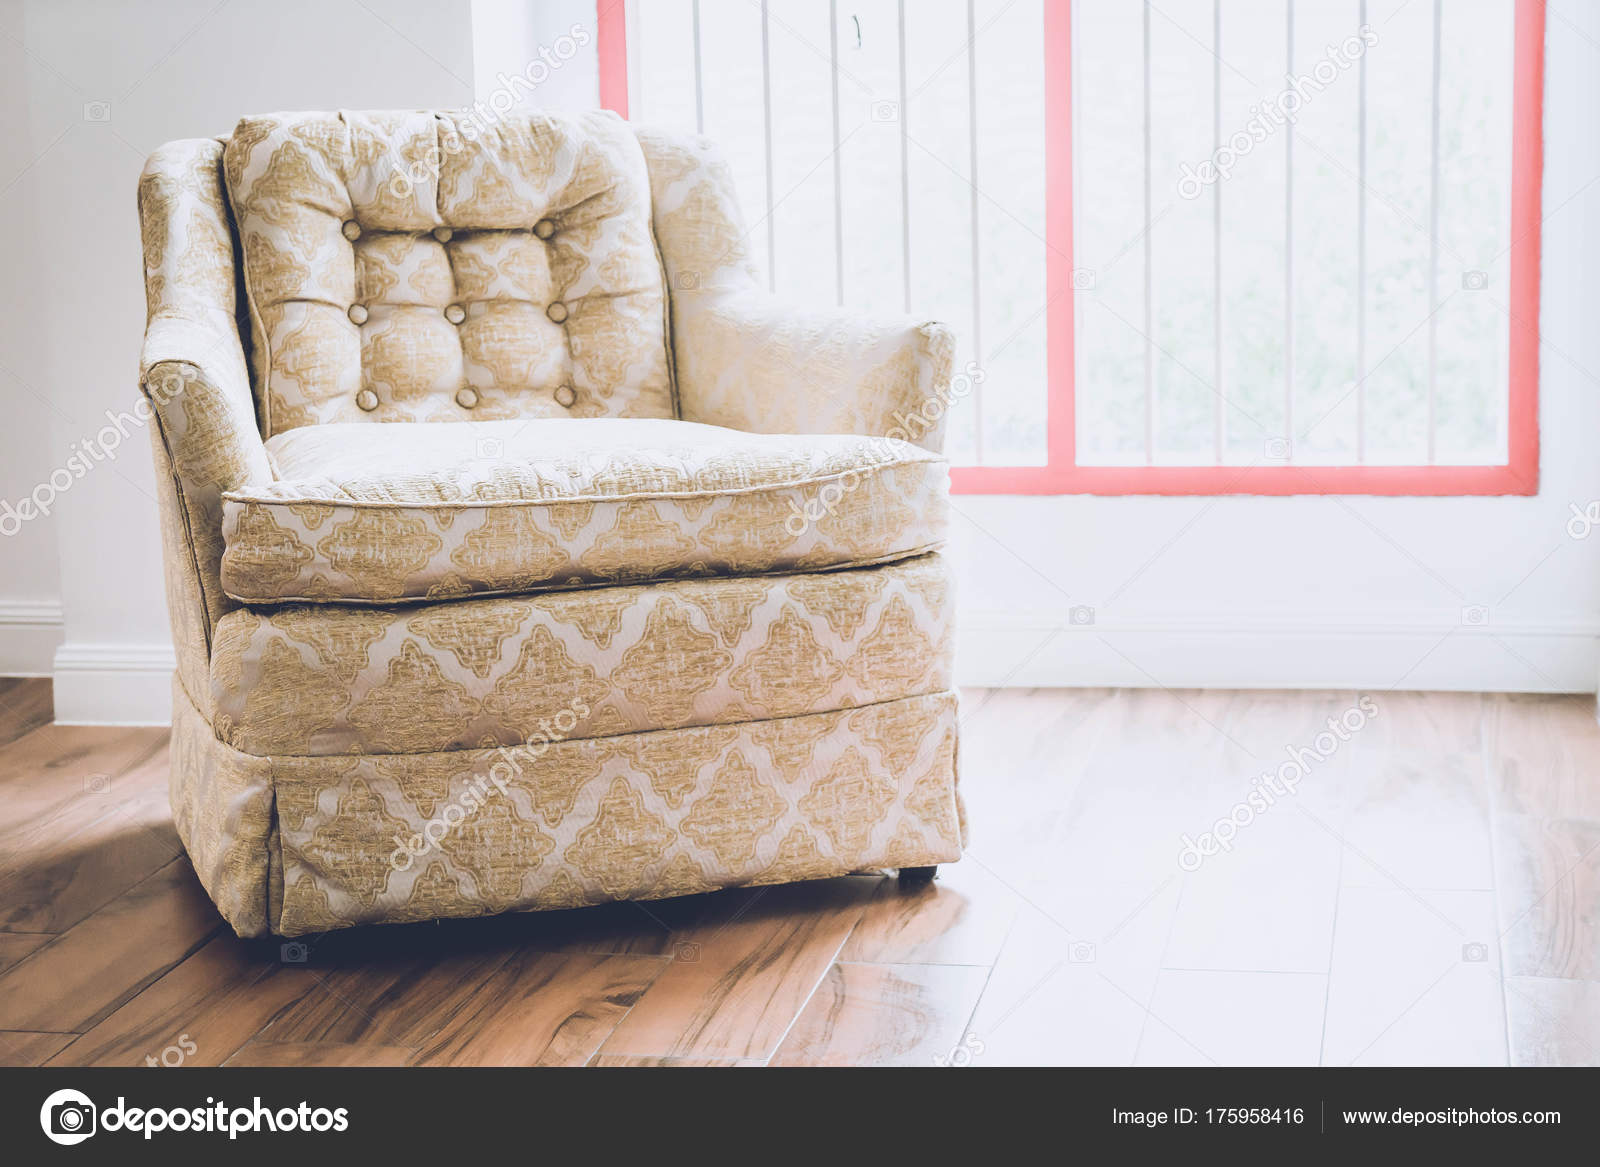 Oude fauteuil decoratie in huis u2014 stockfoto © topntp #175958416